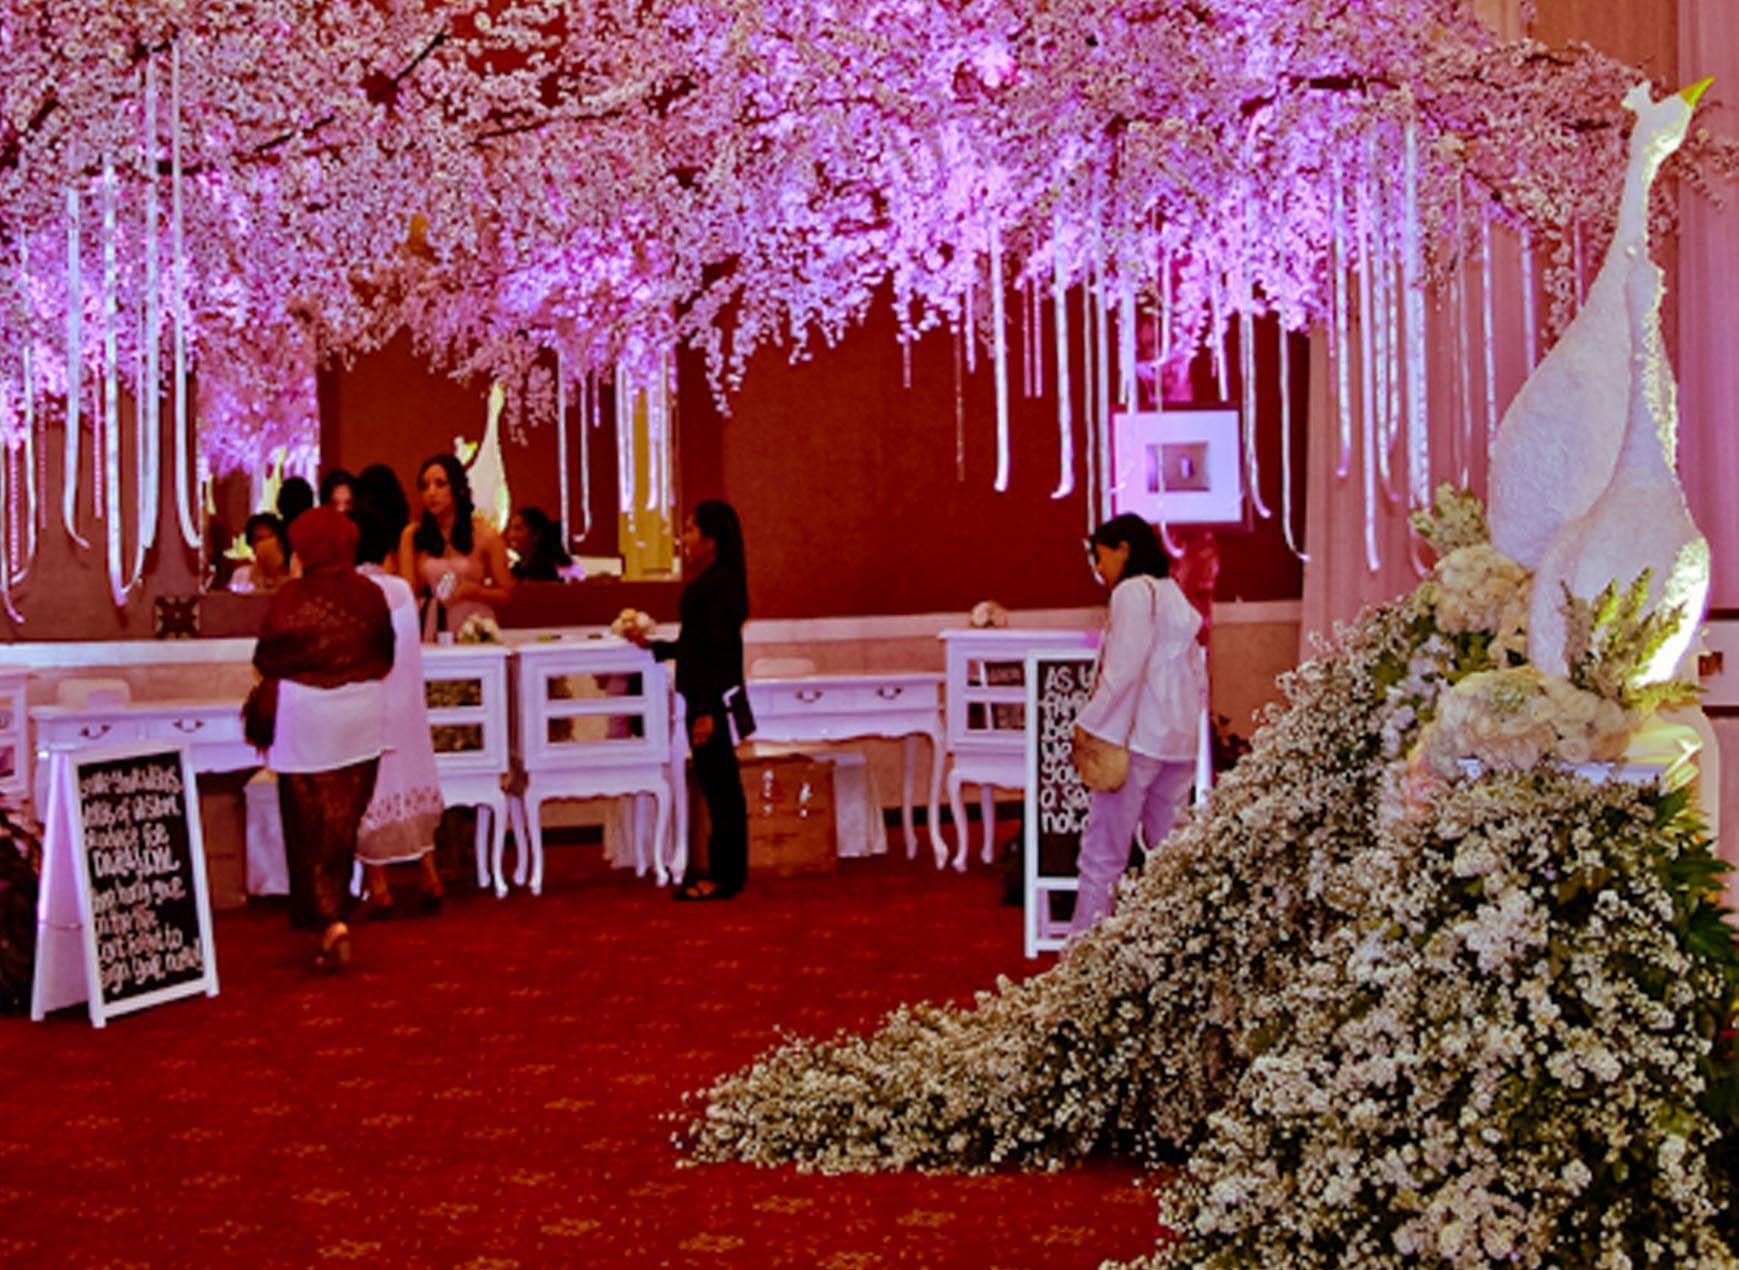 Romance fairytale mawarprada dekorasi pernikahan romantic romance fairytale mawarprada dekorasi pernikahan romantic wedding decoration jakarta junglespirit Choice Image